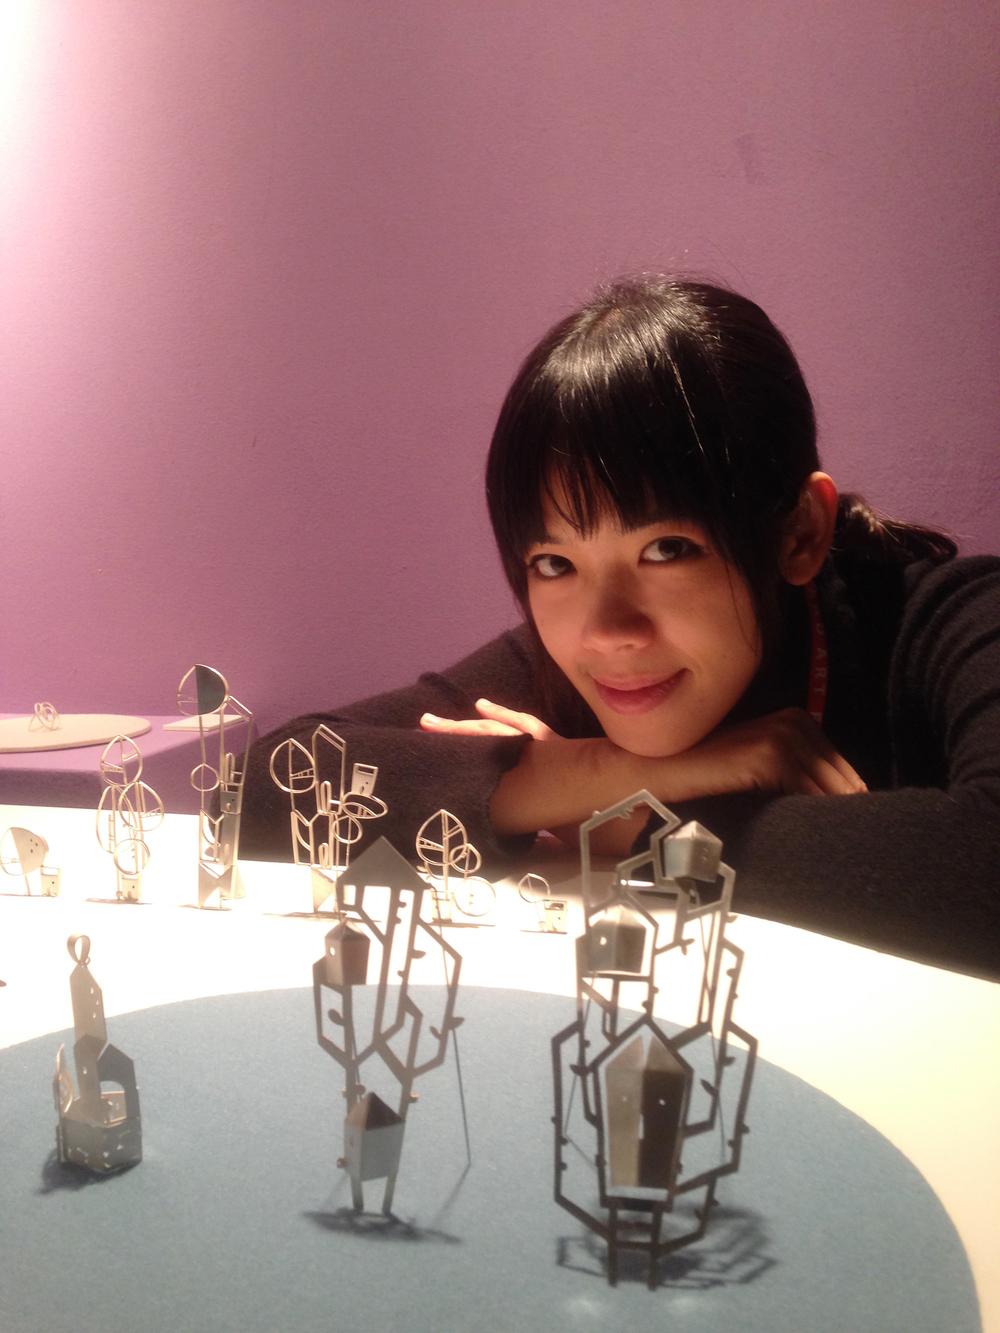 HSIEH I TING 謝宜庭 金工設計師。義大利專業珠寶學校Le Arti Orafe 畢。